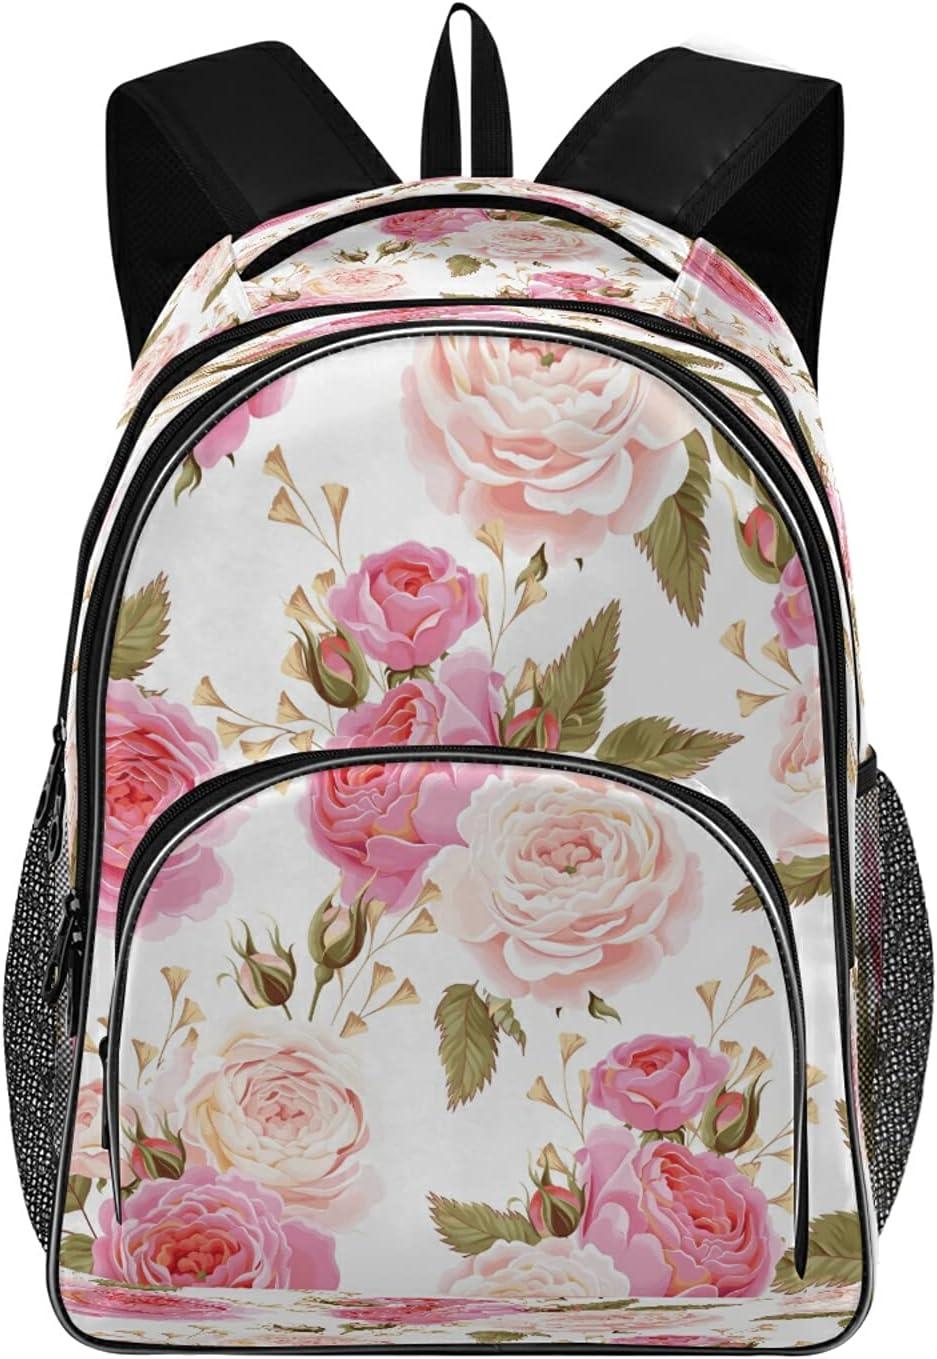 JSLIKE Floral Flower Rose Pink Travel Backpack Laptop for Men Easy-to-use Max 81% OFF Wo